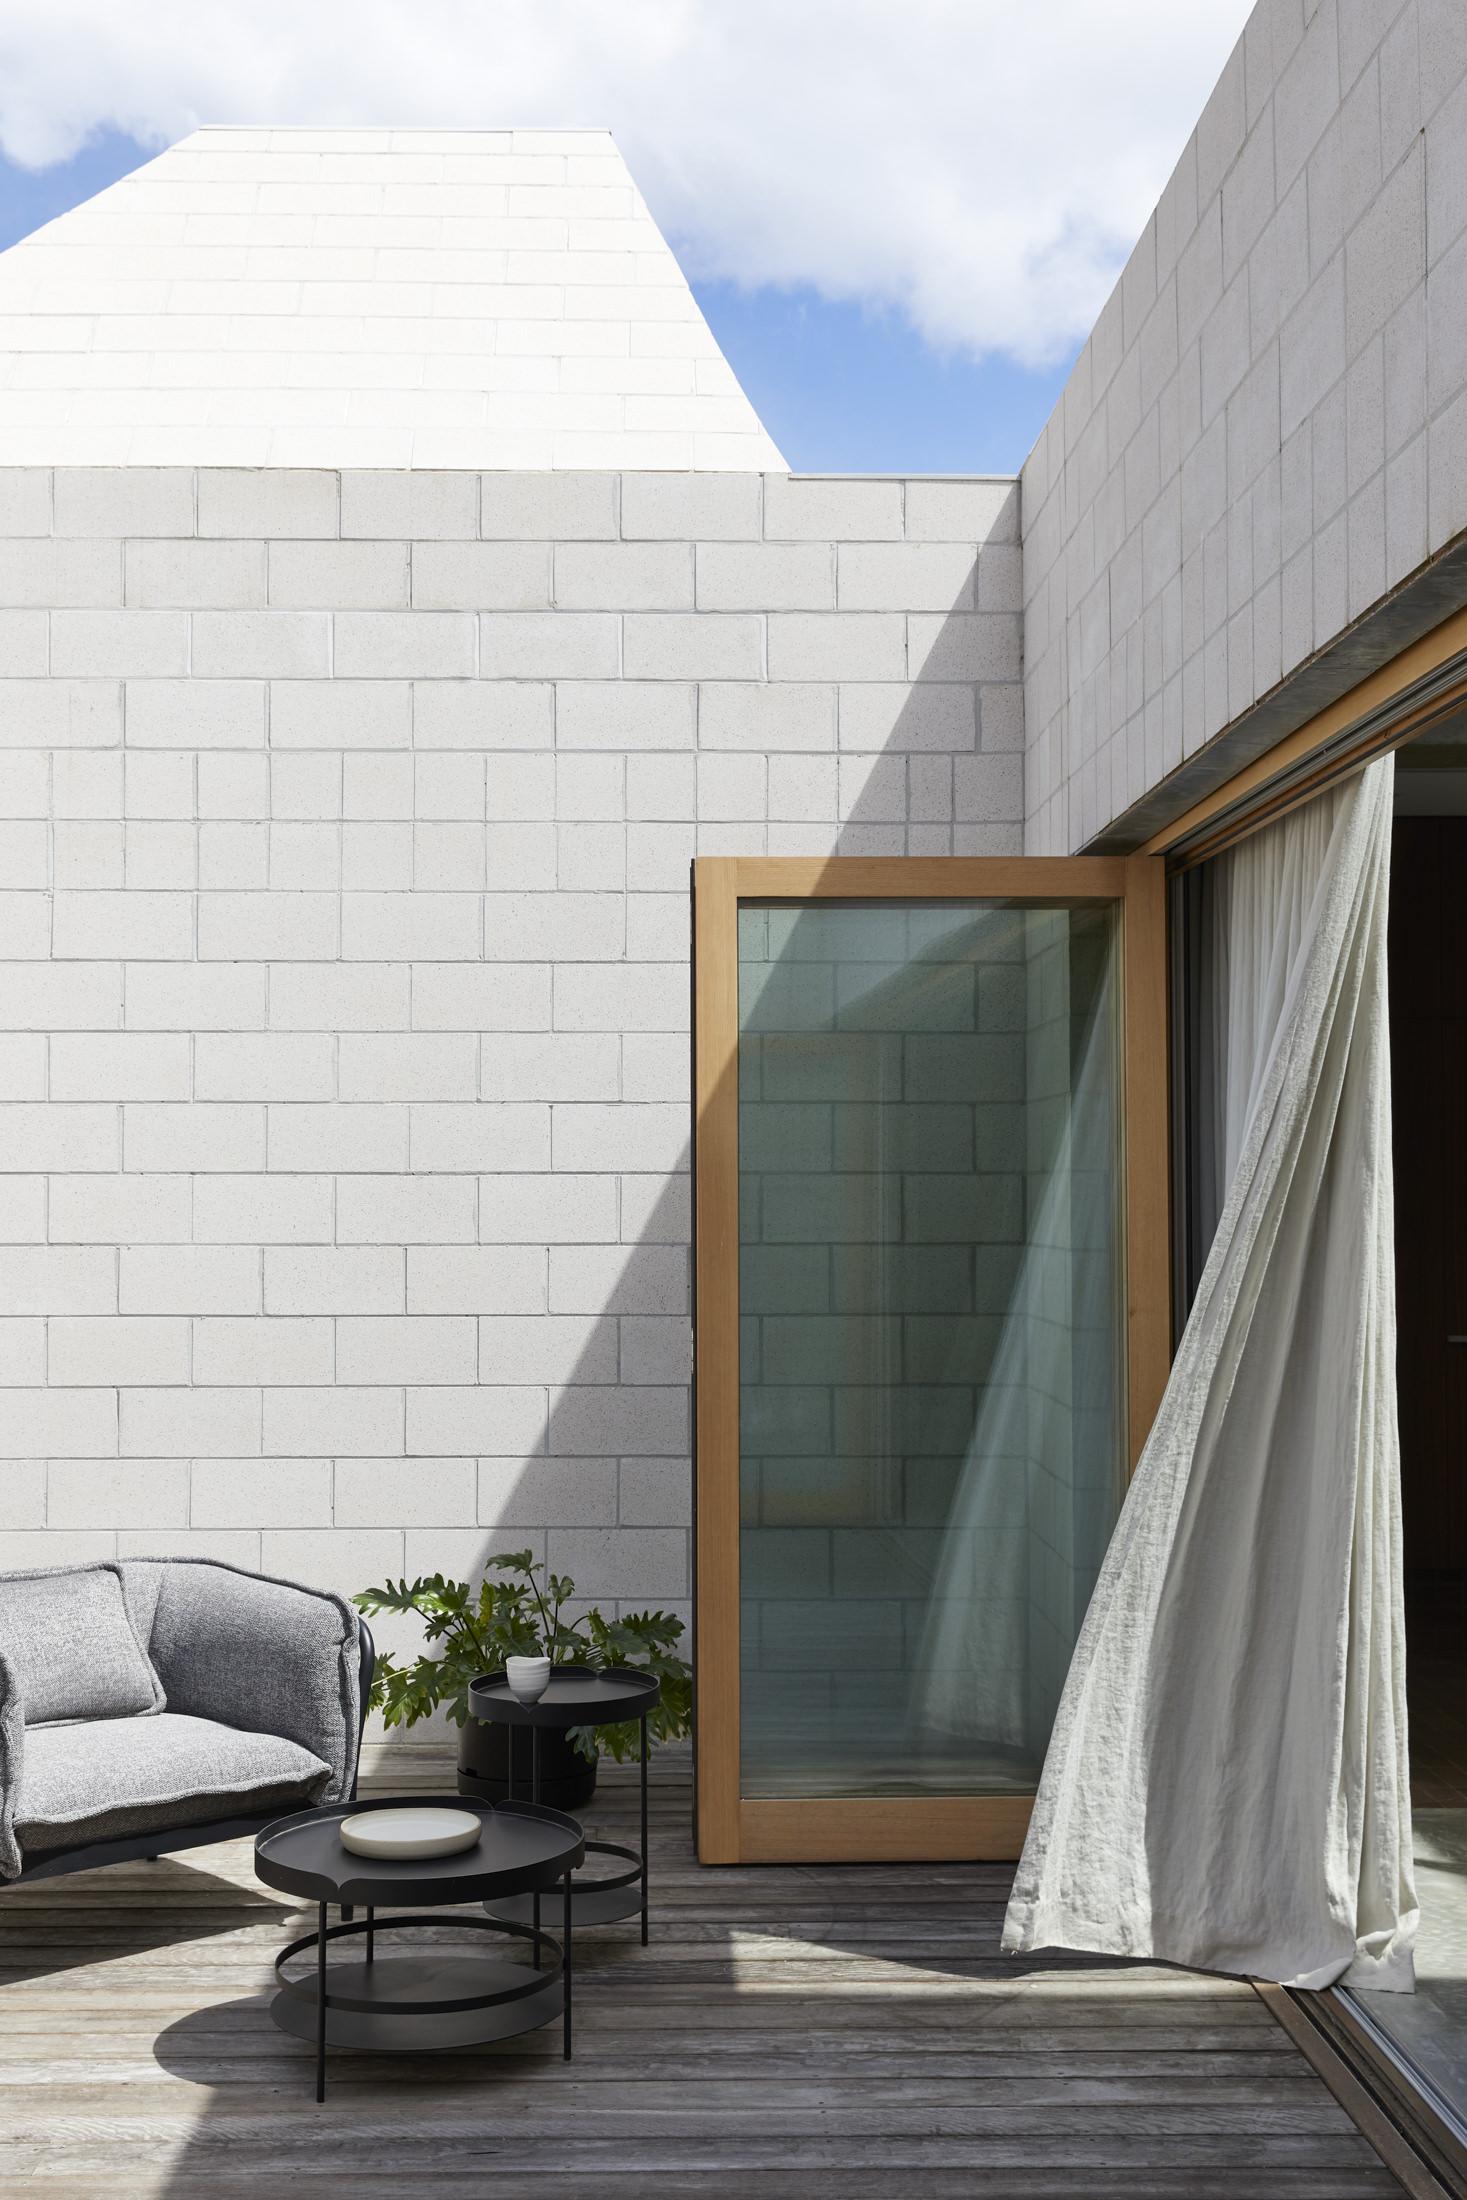 Architects Eat Bellows Beach House Flinders Masonry Architecture Photo Derek Swalwell Yellowtrace 48